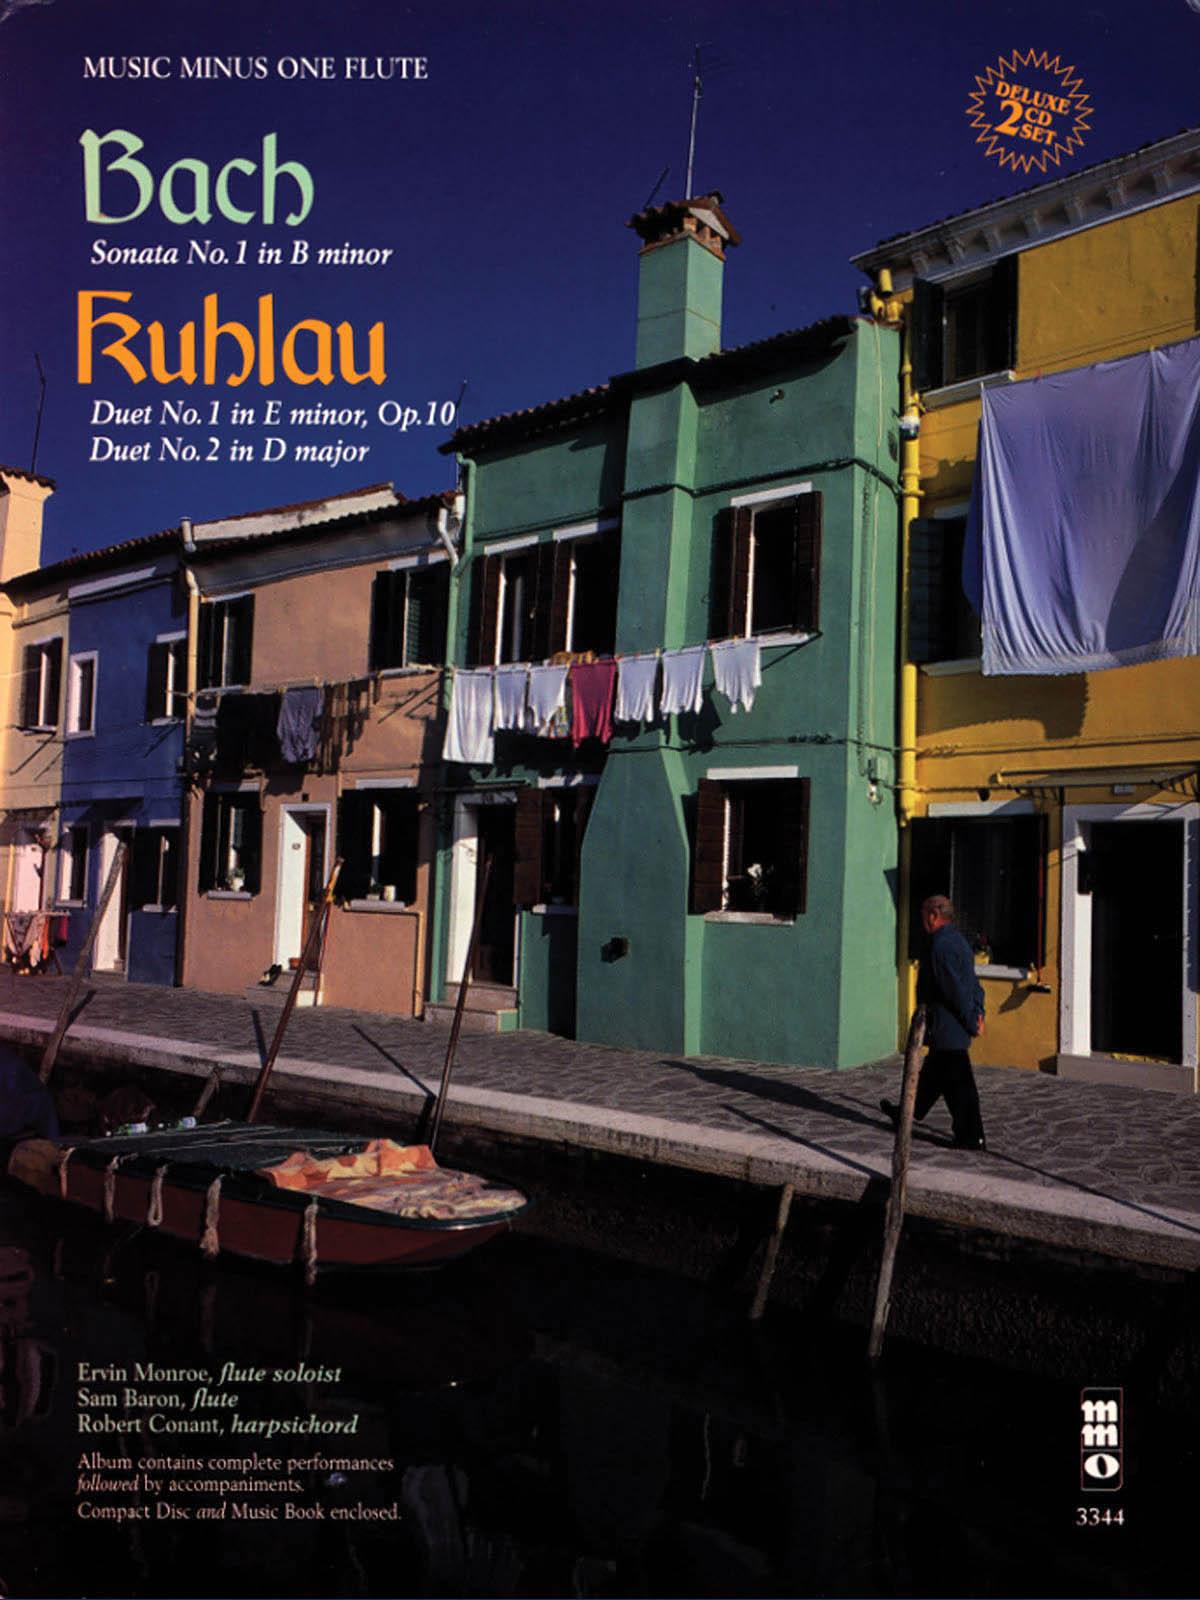 Bach Kuhlau: Sonata No. 1 in B minor - Two Duets: Flute Solo: Instrumental Album